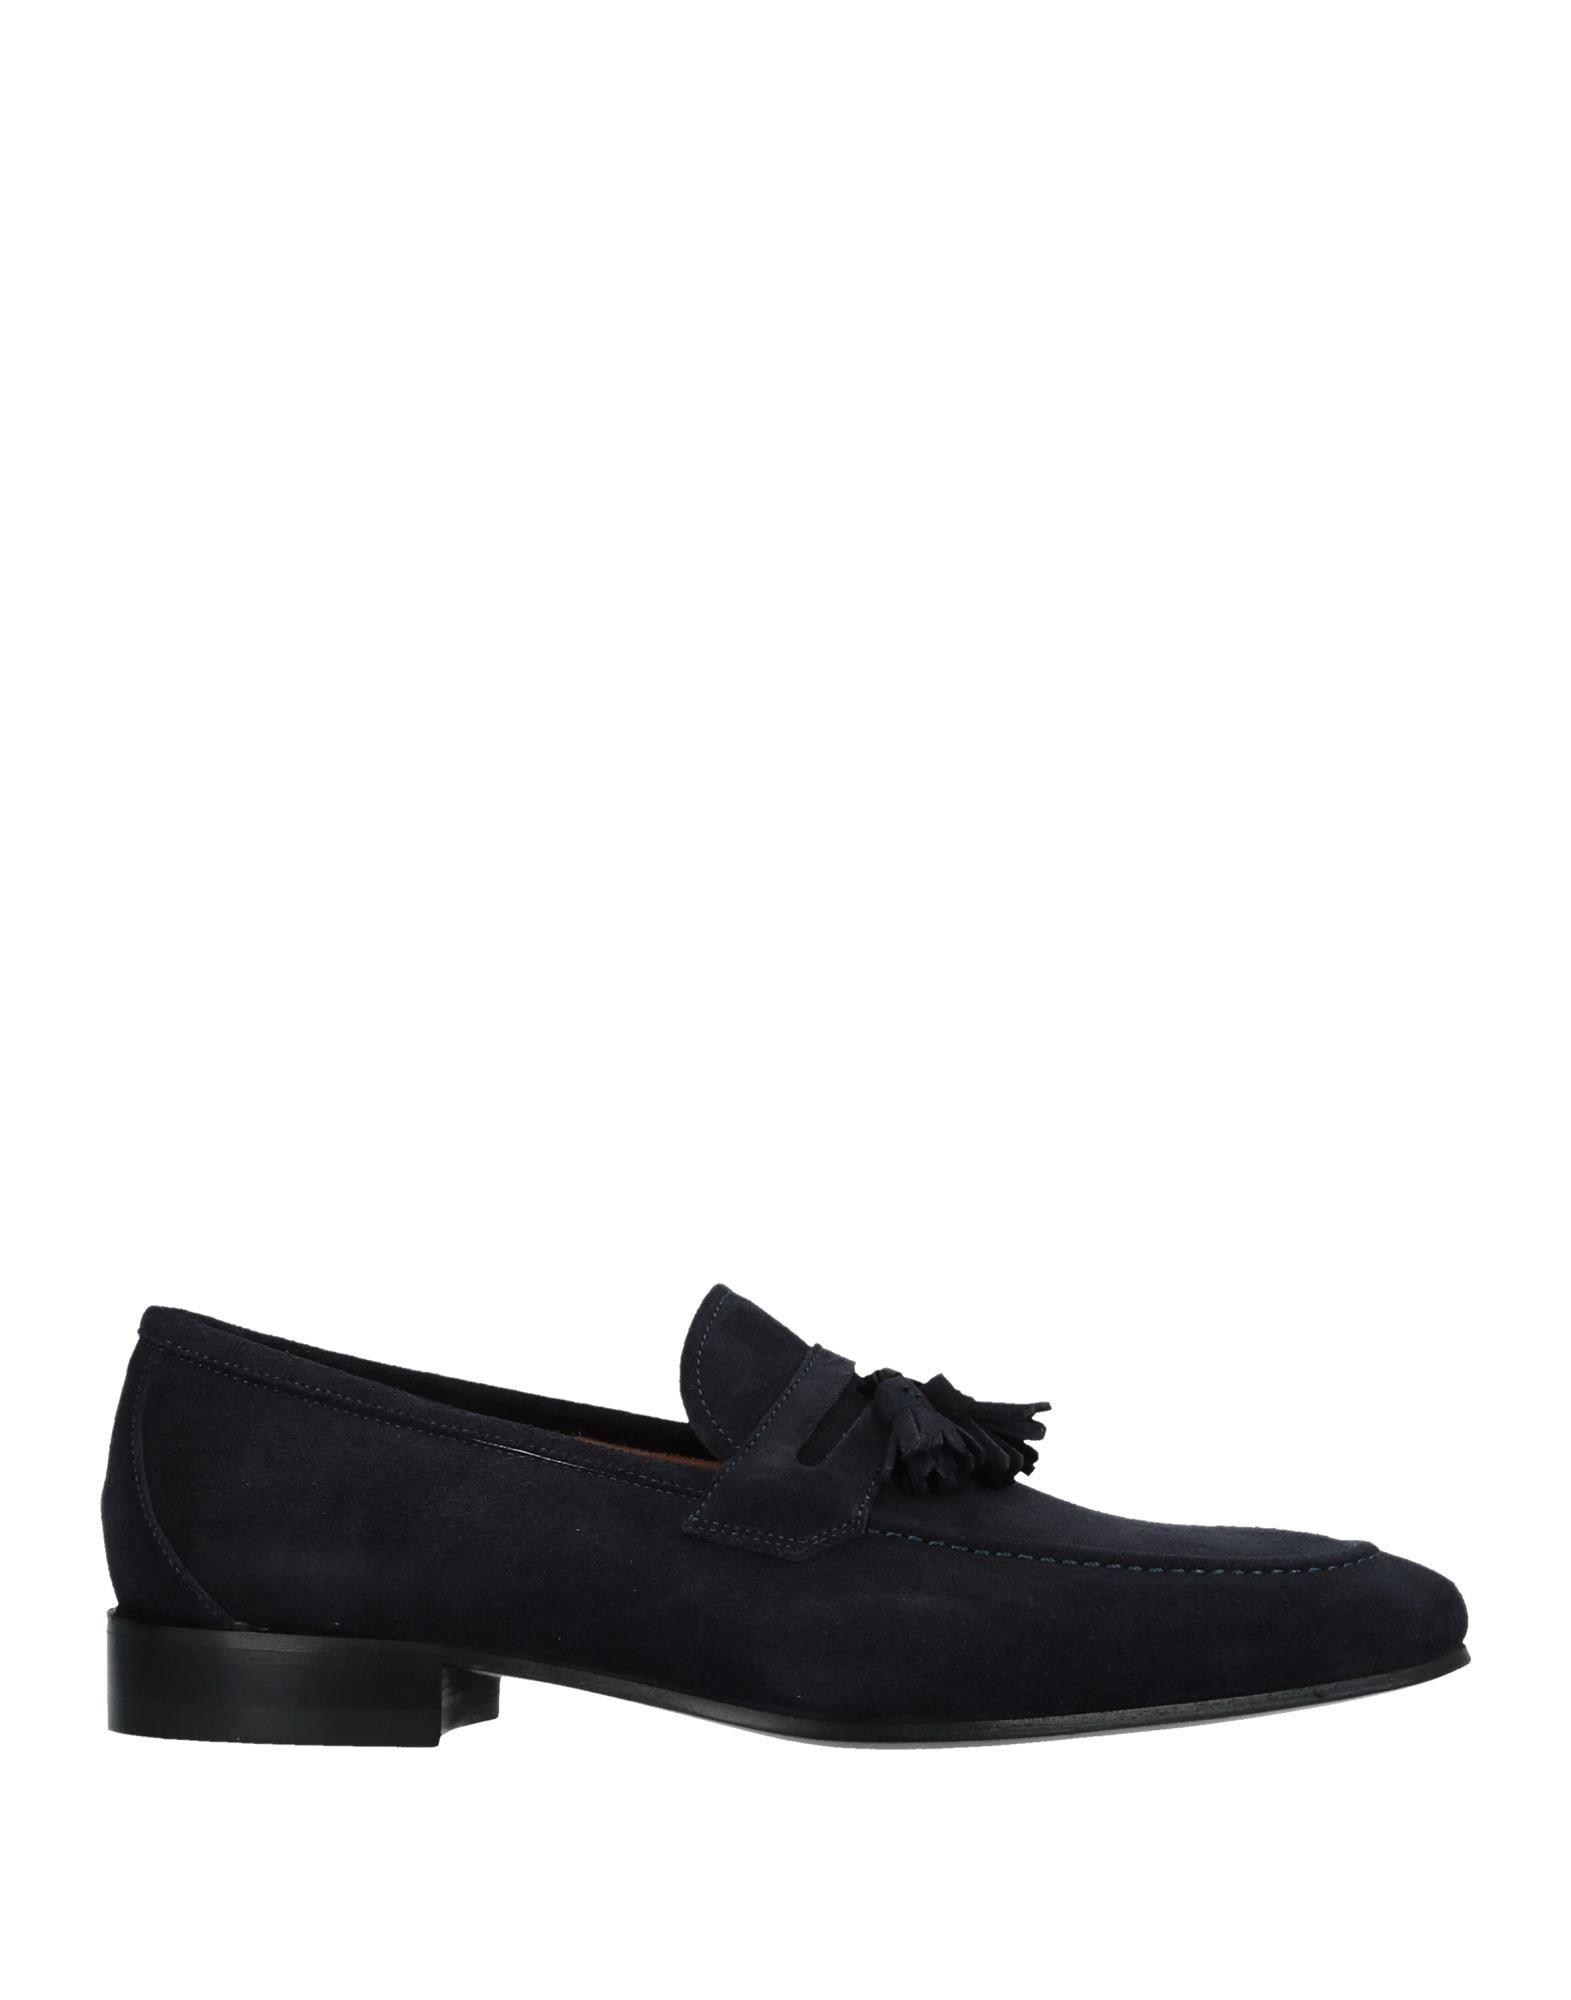 Cantarelli Mokassins Herren beliebte  11507893TC Gute Qualität beliebte Herren Schuhe e1cfad